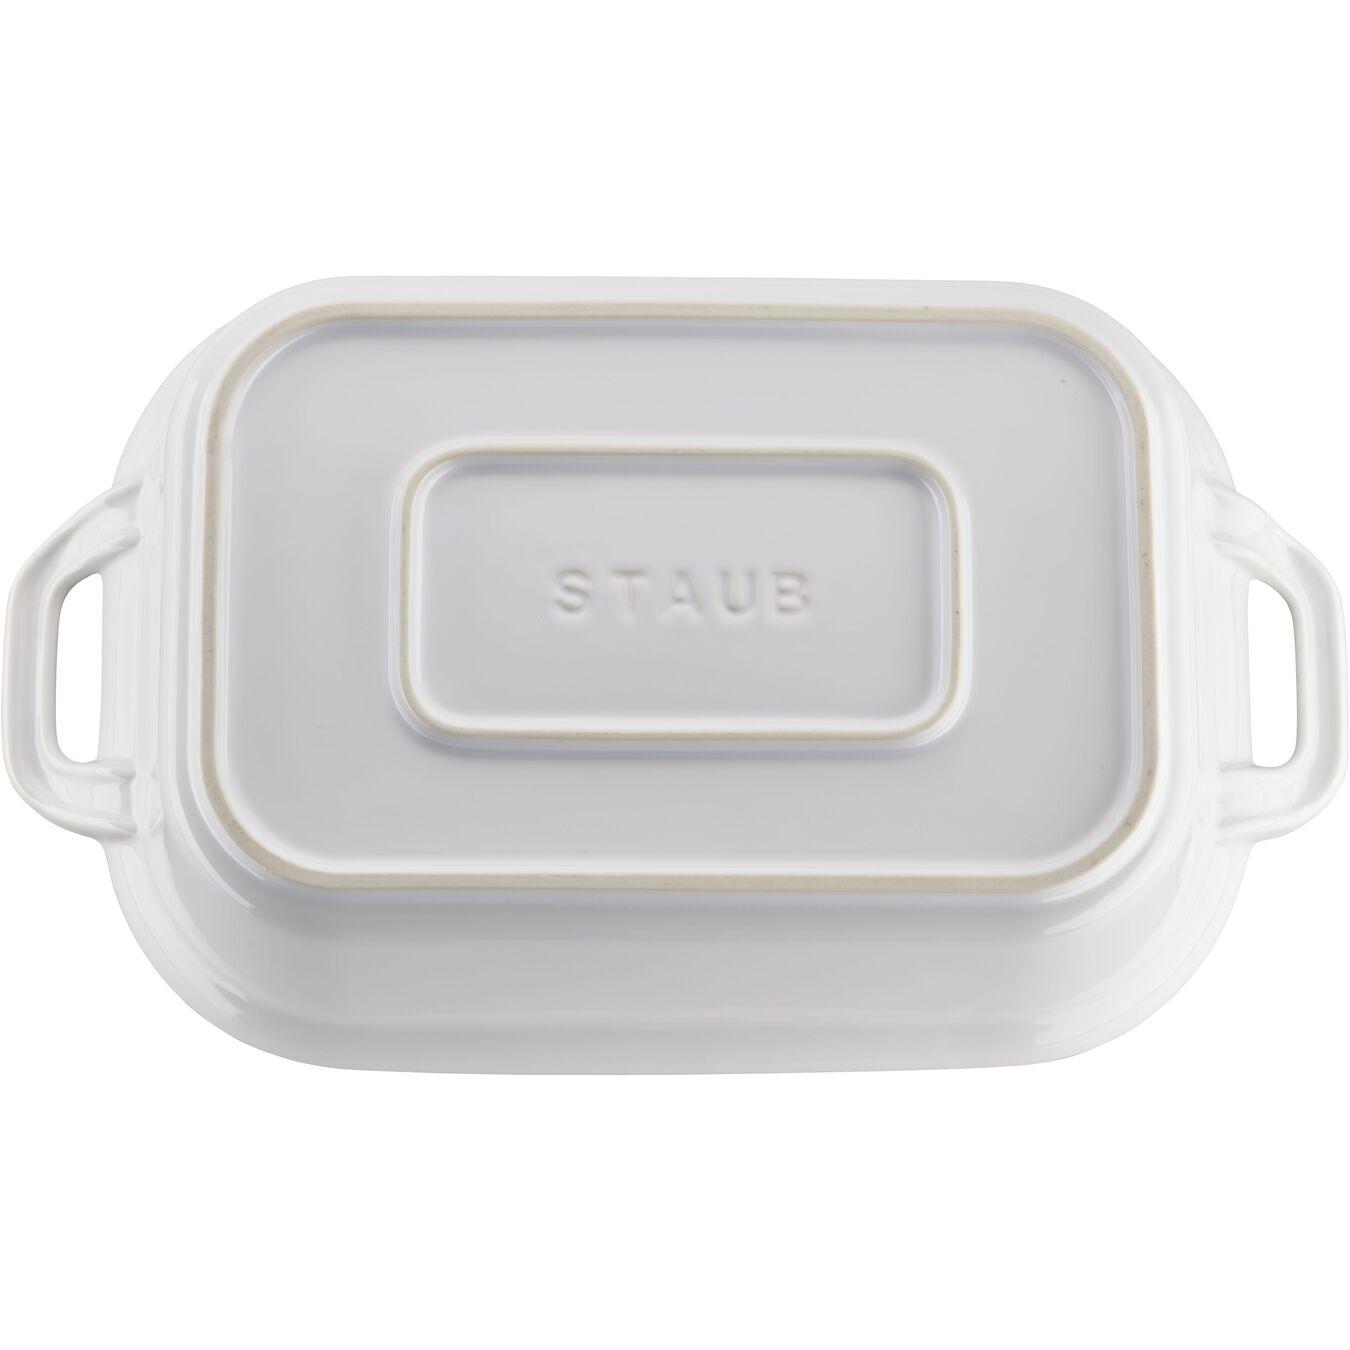 rectangular, Special shape bakeware, white,,large 5